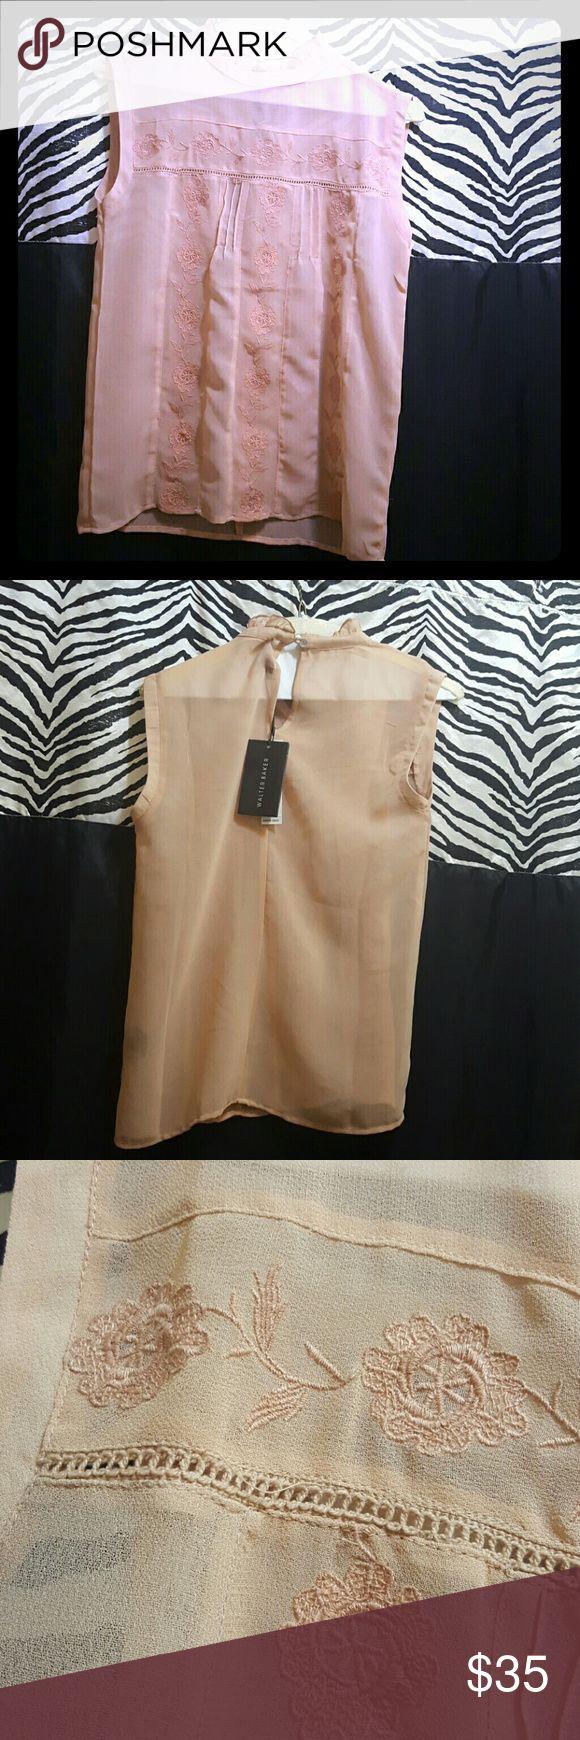 Walter baker blouse Walter Baker sleeveless pink Molly top. Light embroidered pink blouse. Walter Baker Tops